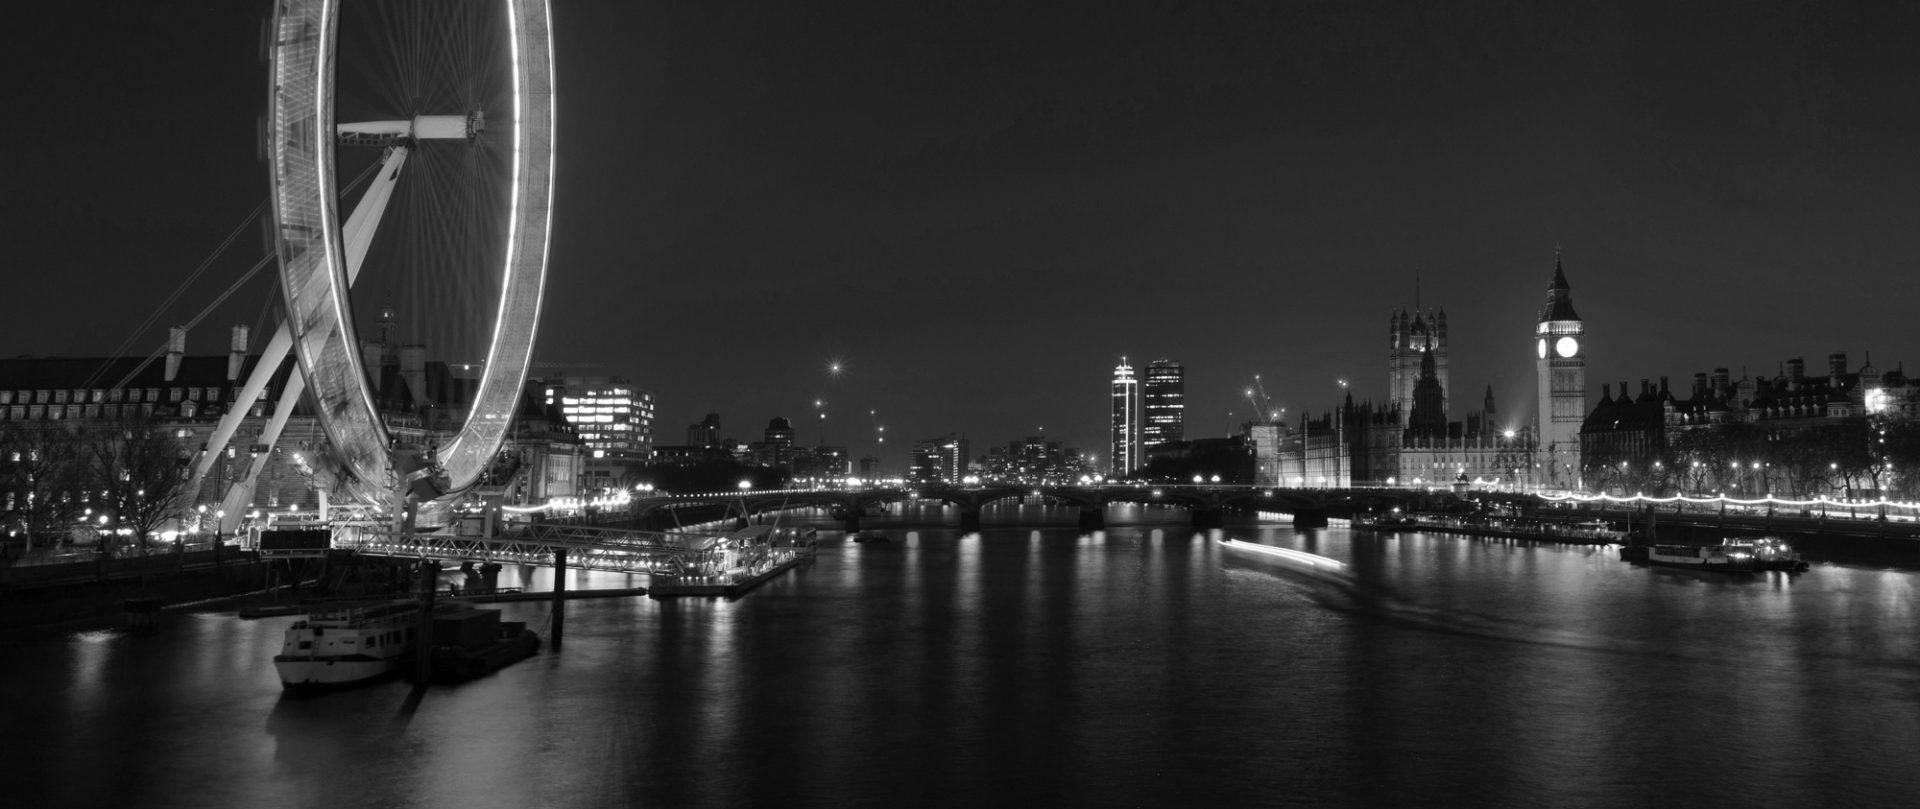 london skyline background imagery